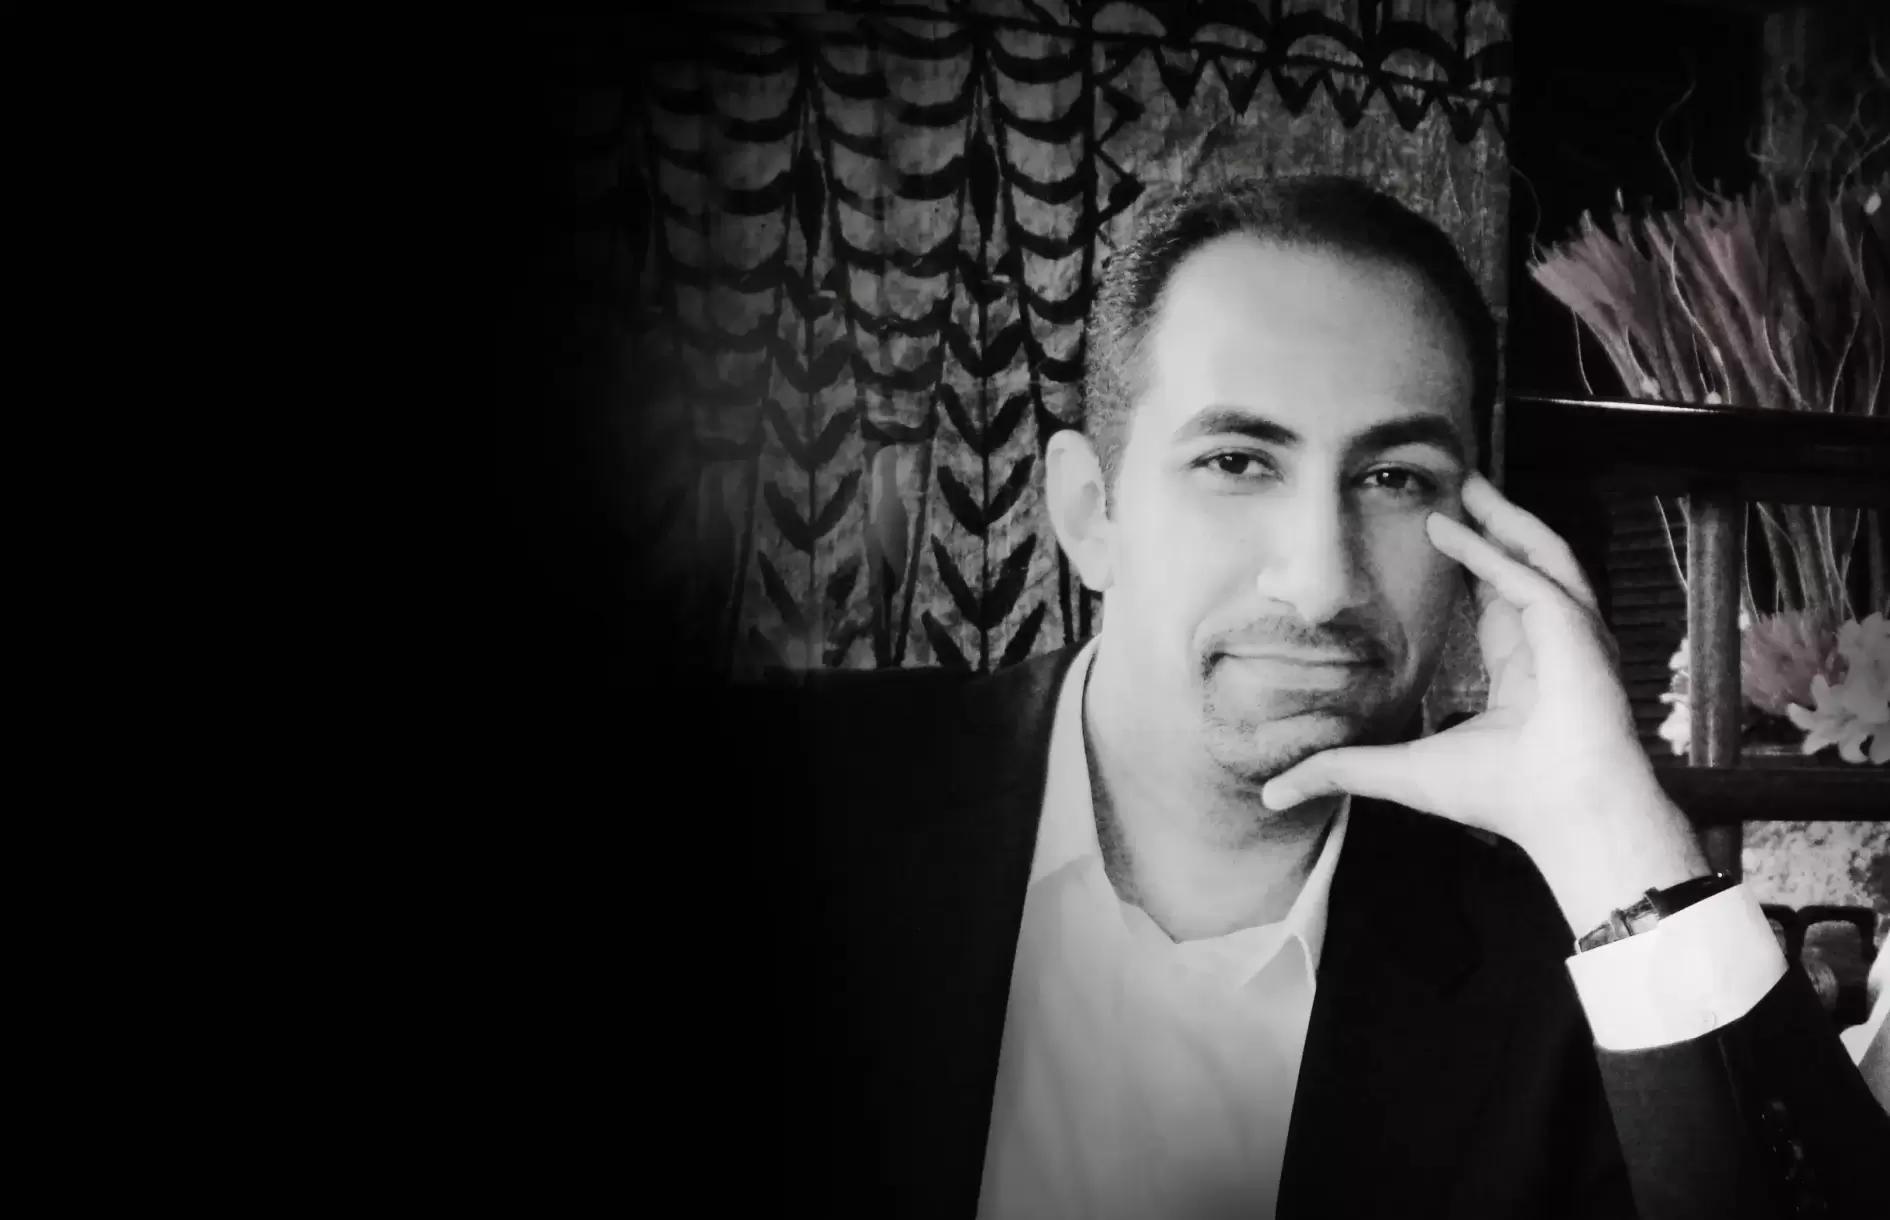 wesam al rashid portrait in black and white